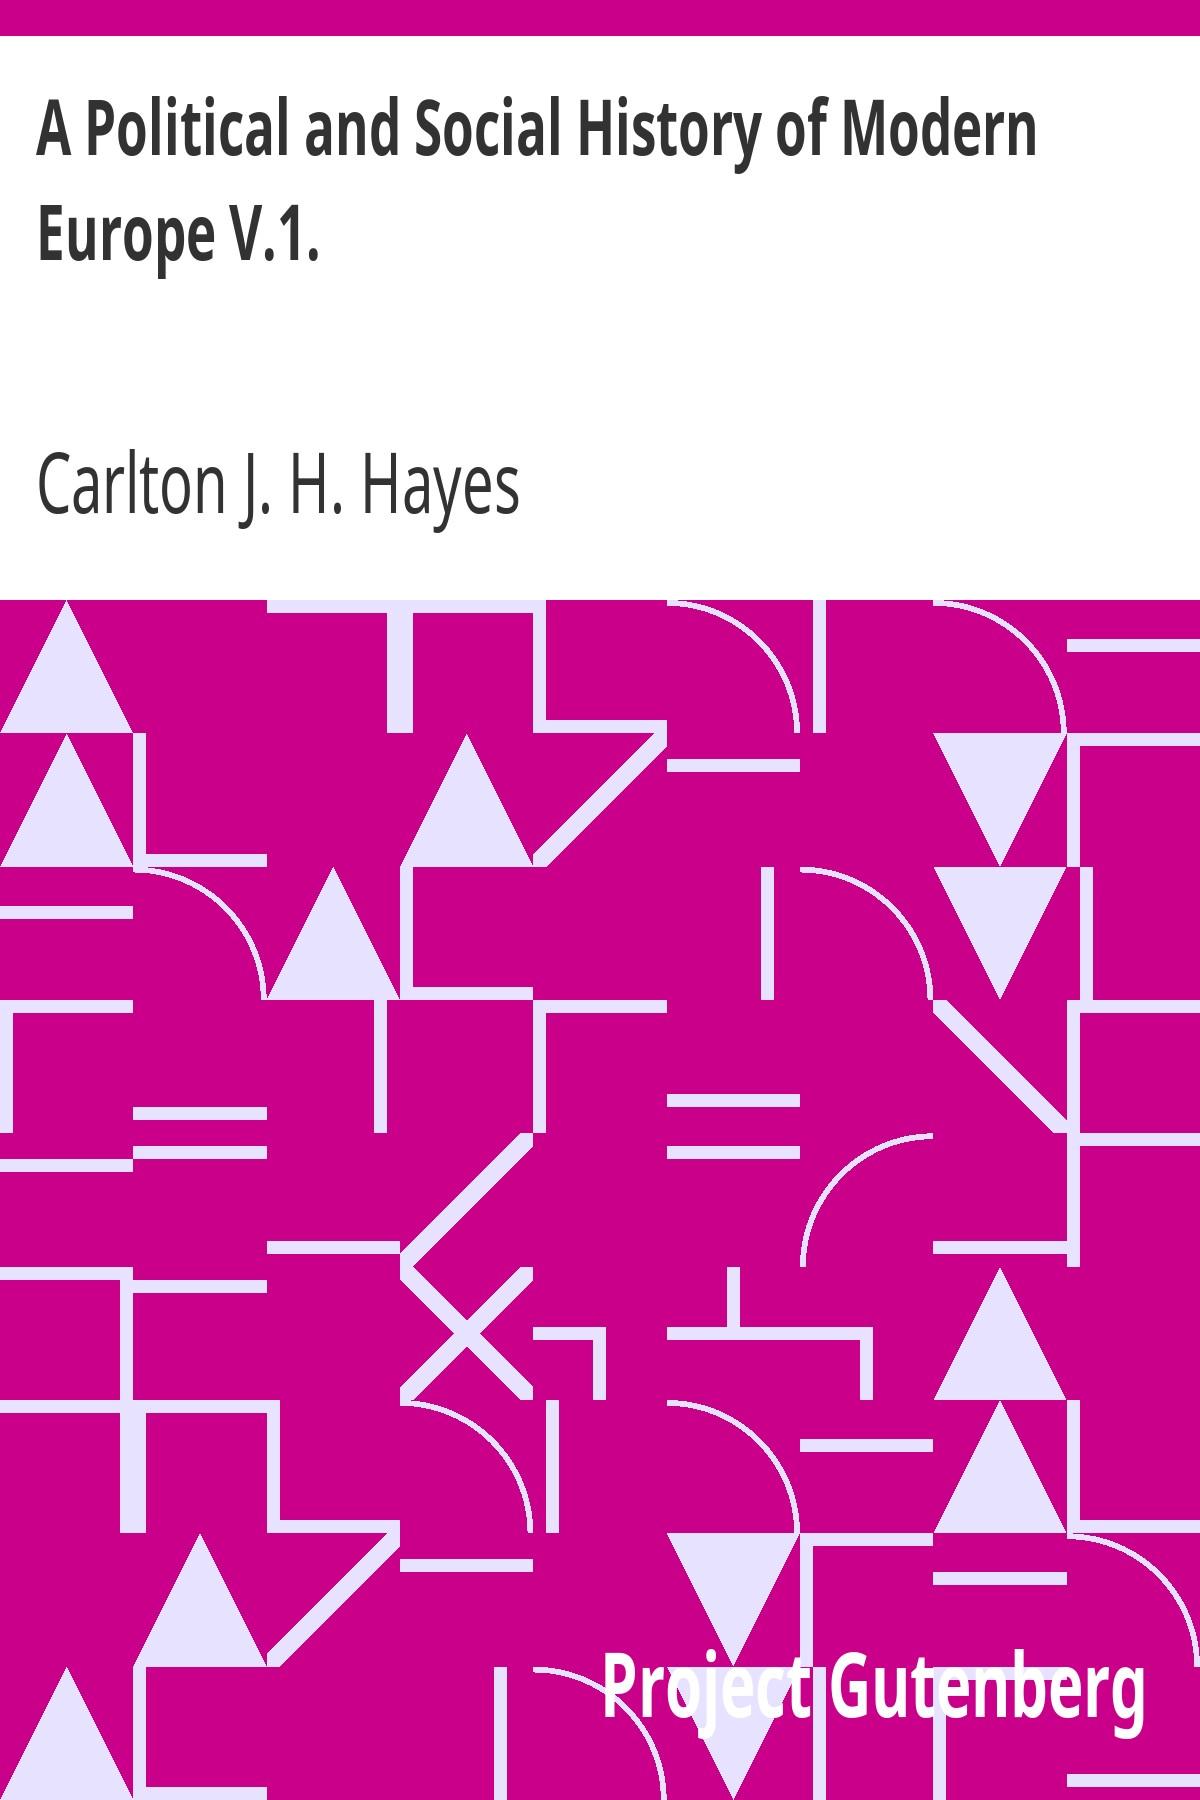 Carlton Joseph Huntley Hayes A Political and Social History of Modern Europe V.1.